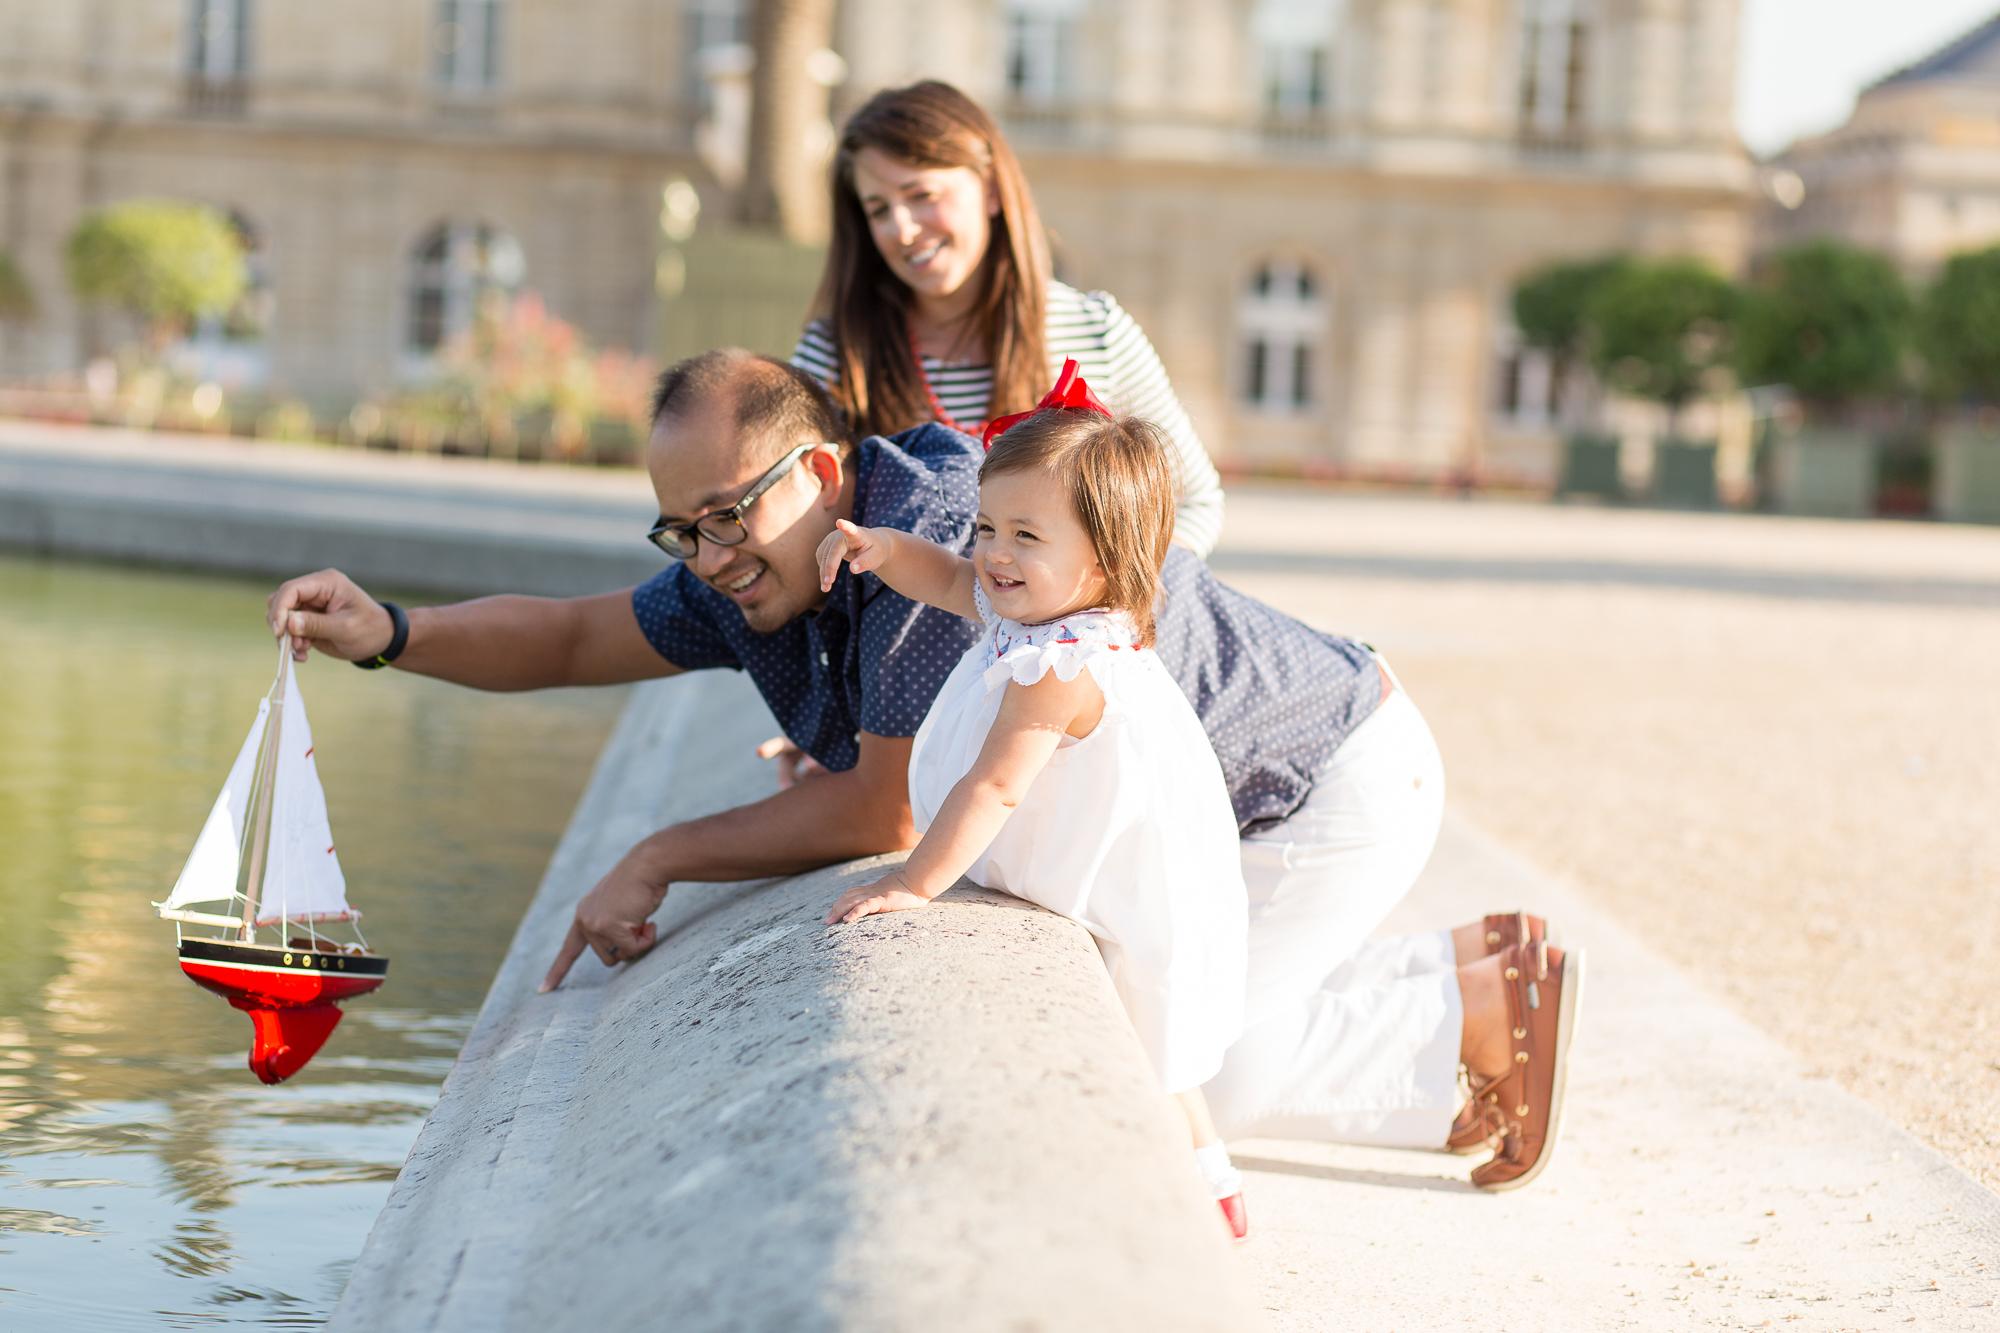 paris-europe-lifestyle-family-photographer-16.jpg